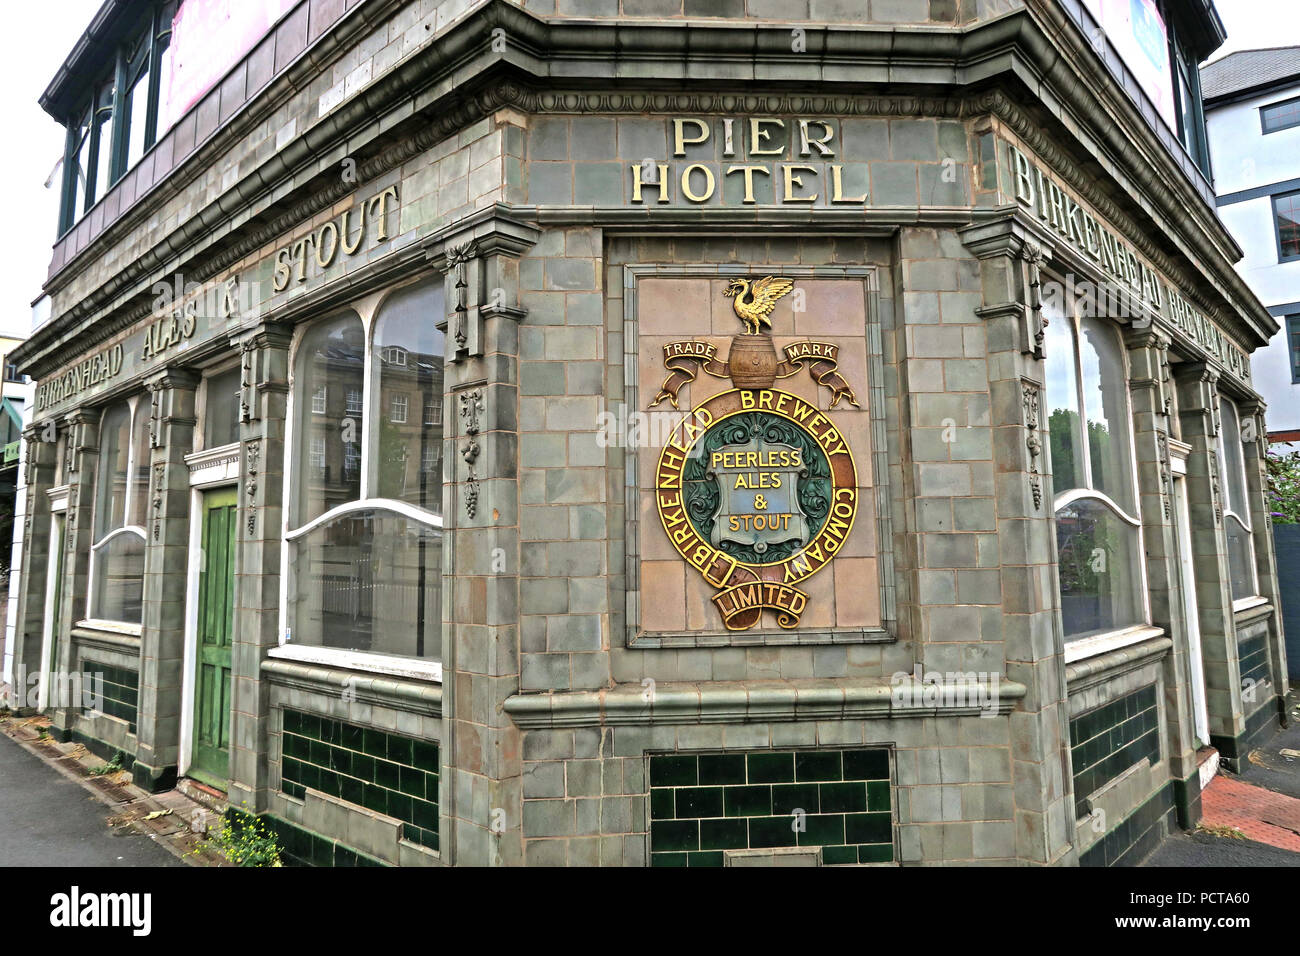 The Pier Hotel, Birkenhead Central, Birkenhead,  Canning Street, Birkenhead, Wirral, CH41 6QS - Stock Image